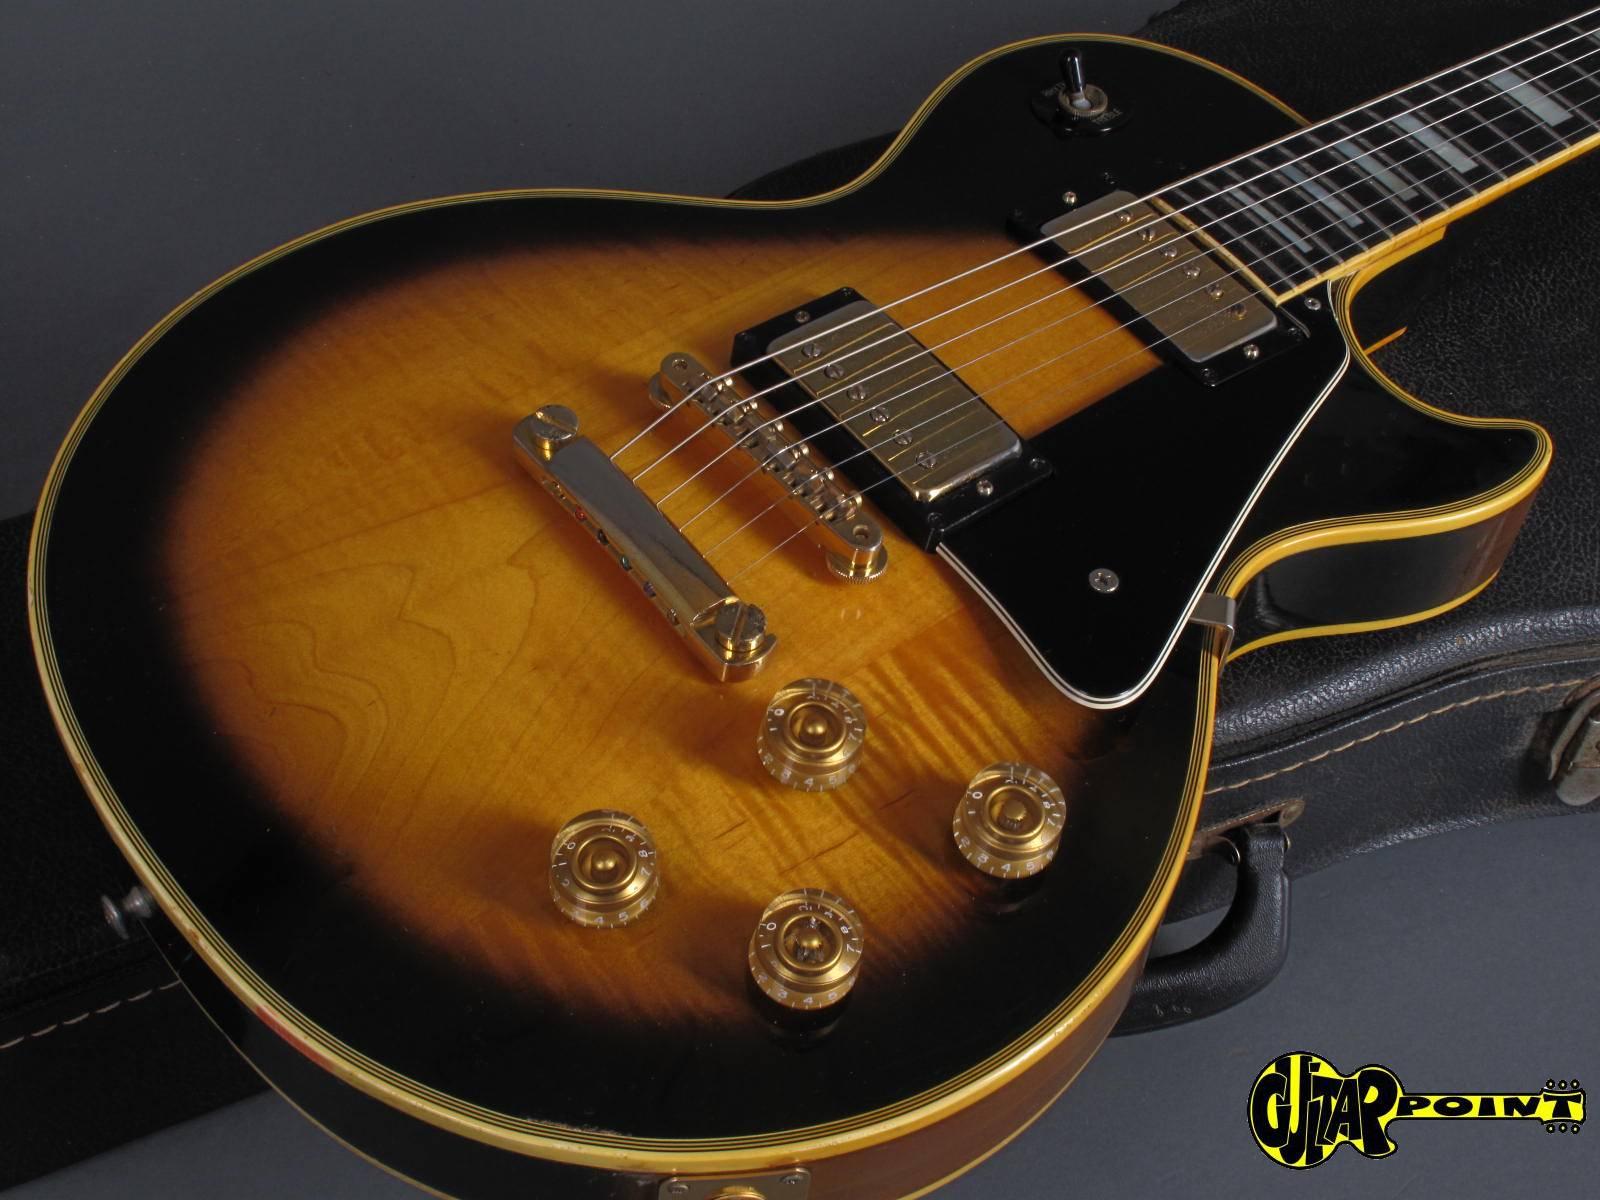 gibson les paul custom 1974 tobacco sunburst guitar for sale guitarpoint. Black Bedroom Furniture Sets. Home Design Ideas